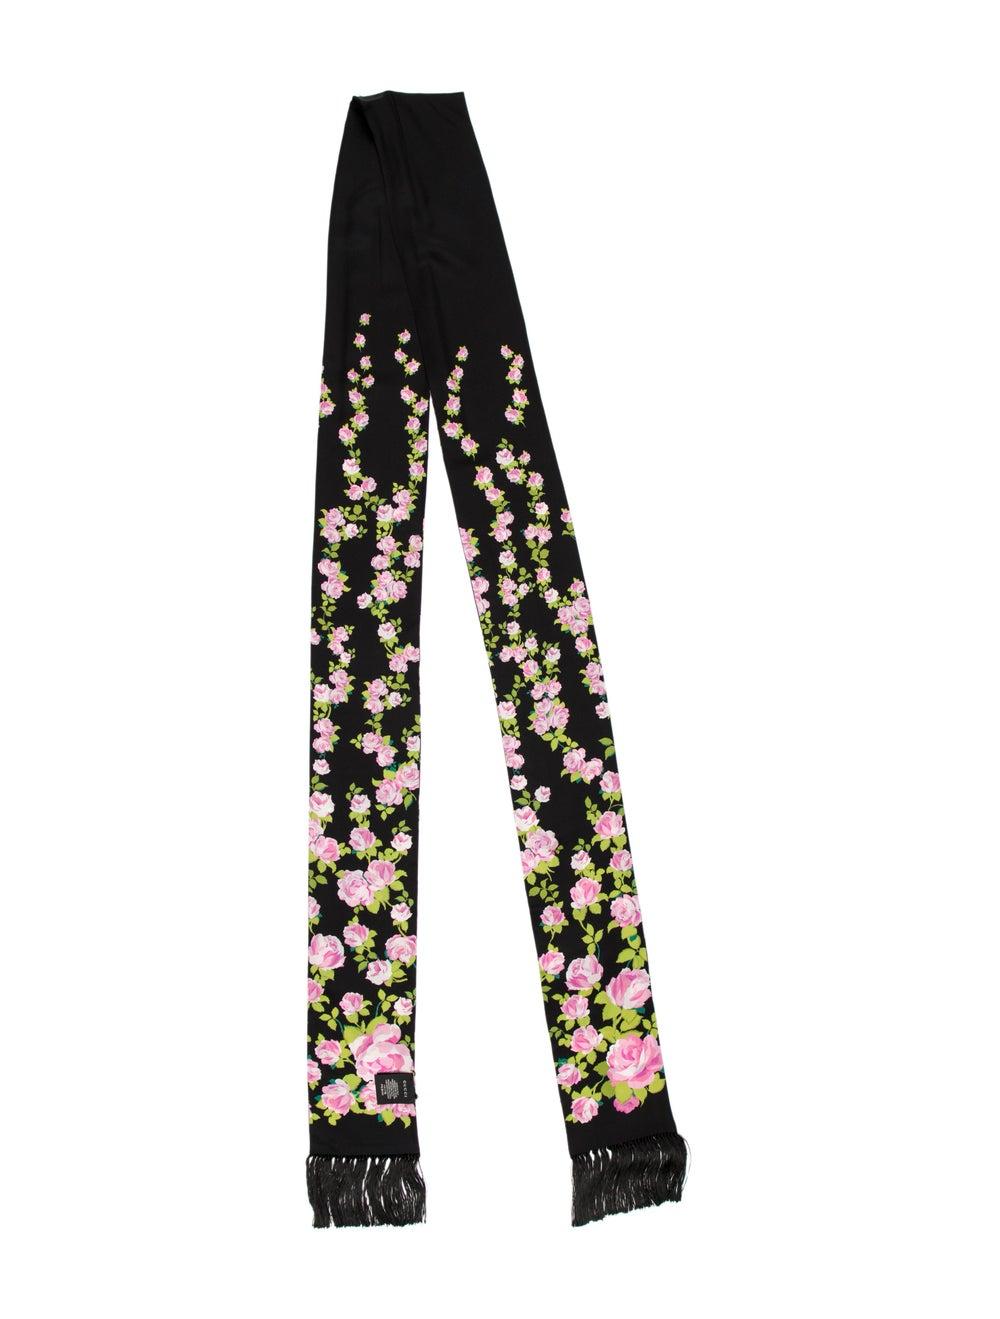 Gucci Floral Fringe Scarf w/ Tags Black - image 1